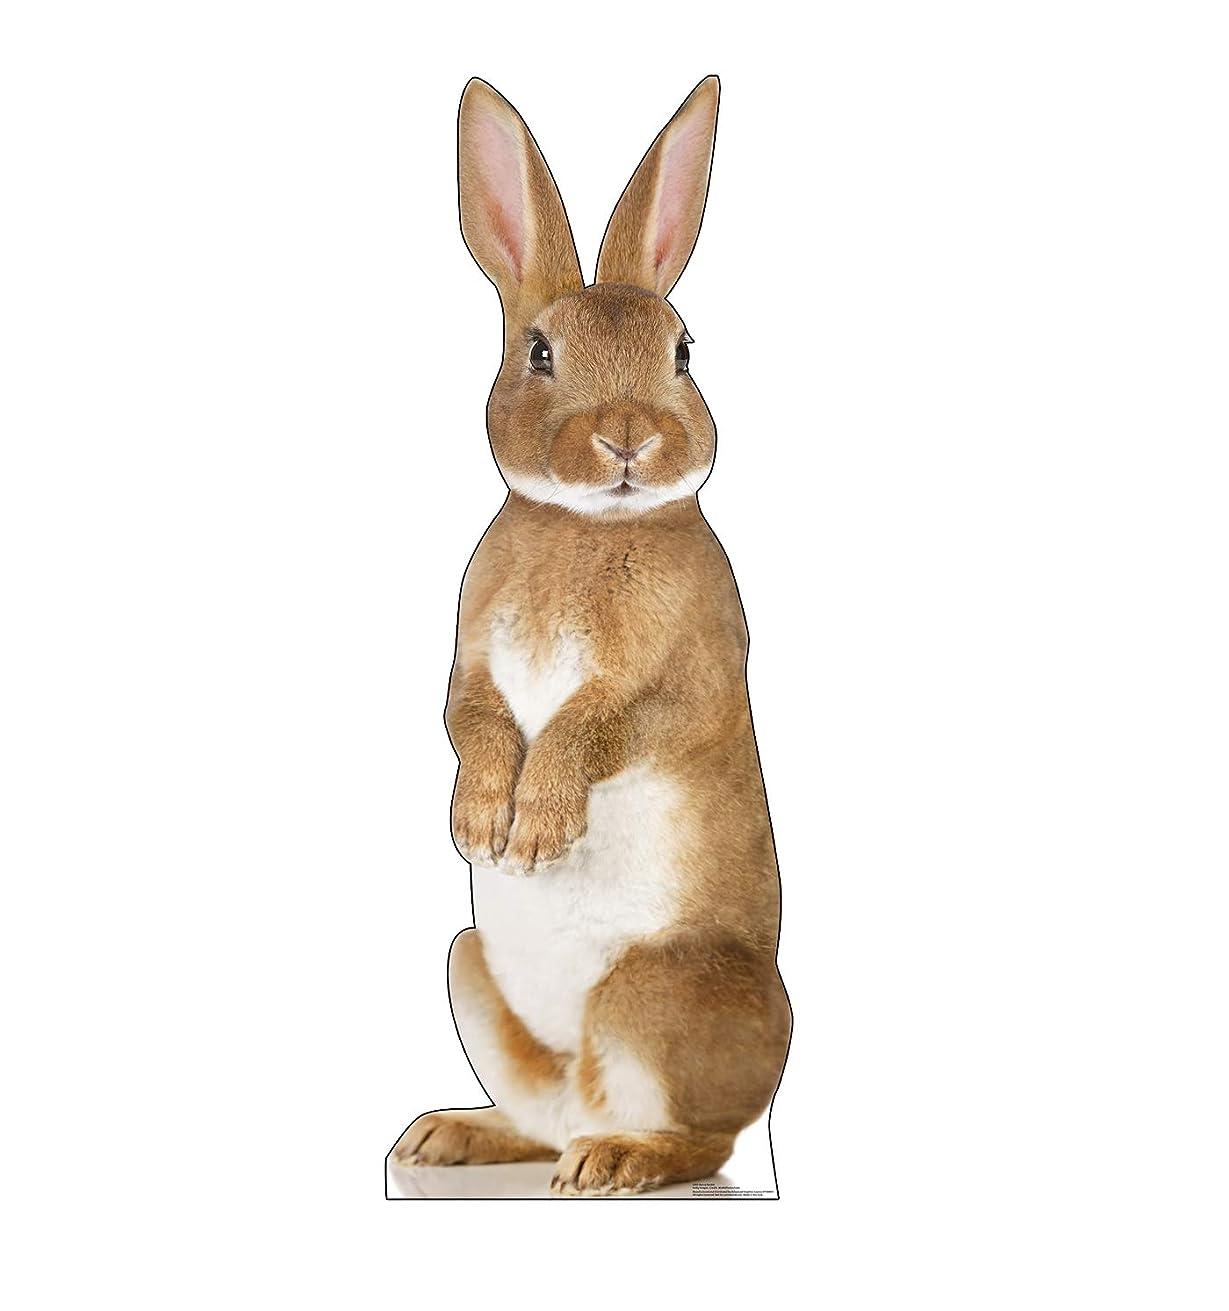 Advanced Graphics Bunny Rabbit Life Size Cardboard Cutout Standup